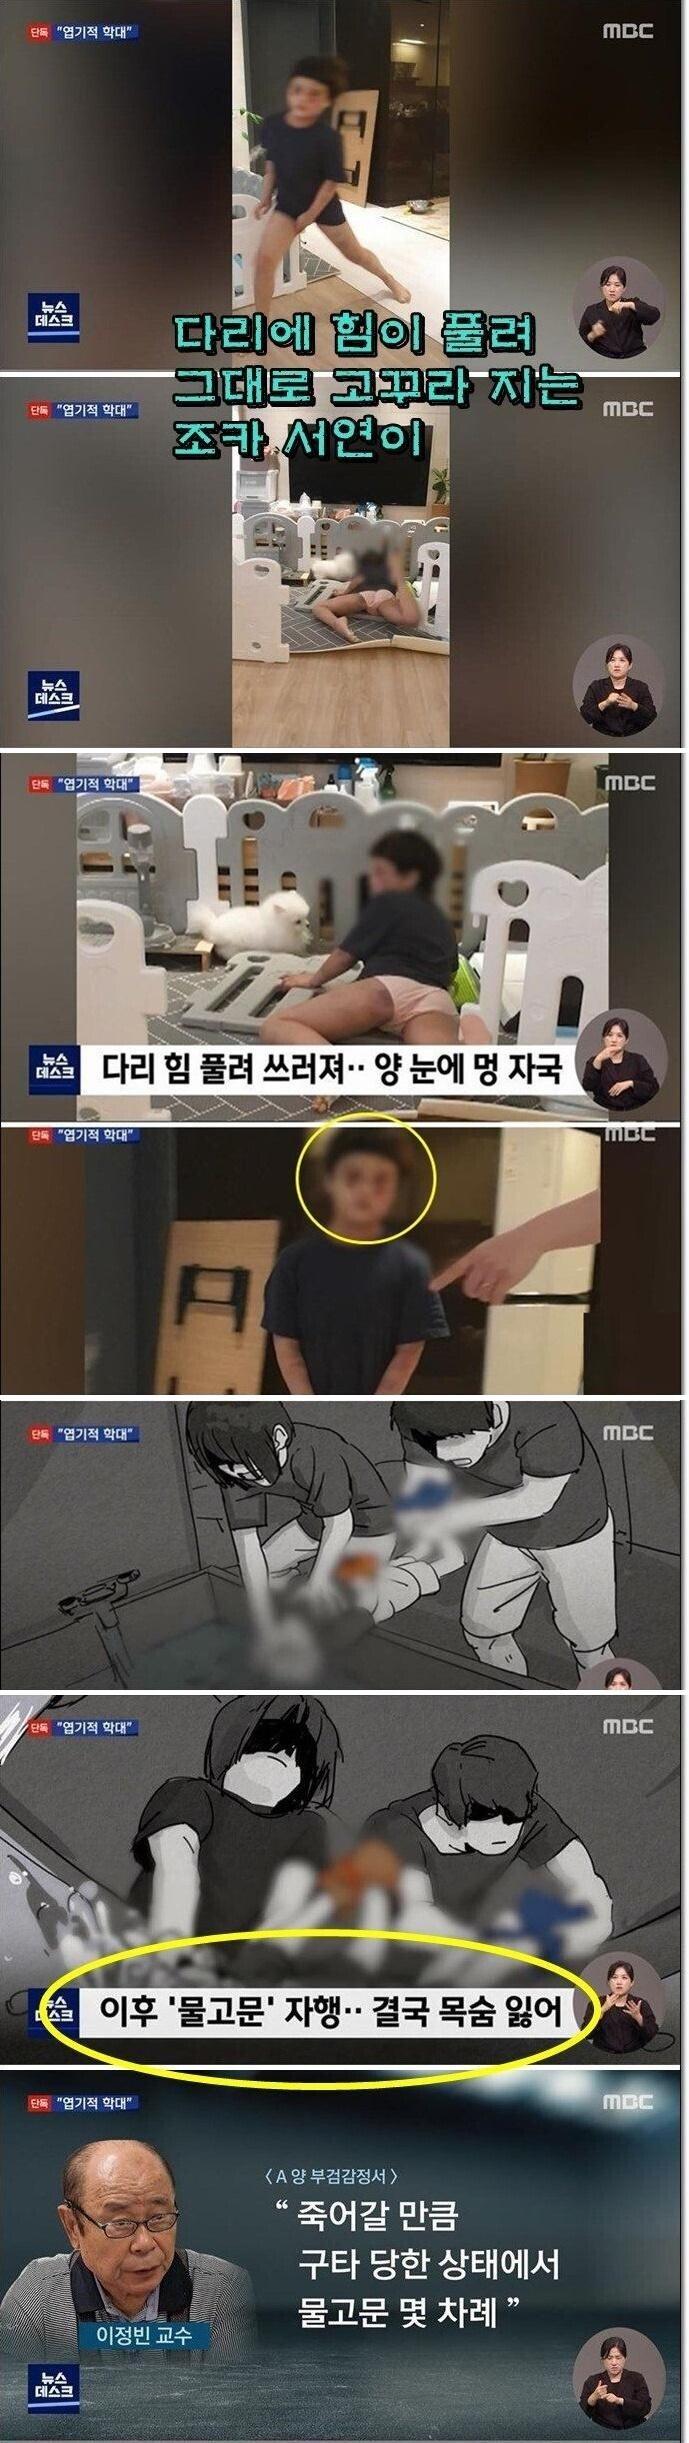 2.jpg 극혐) 난리난 이모부부 사건.JPG